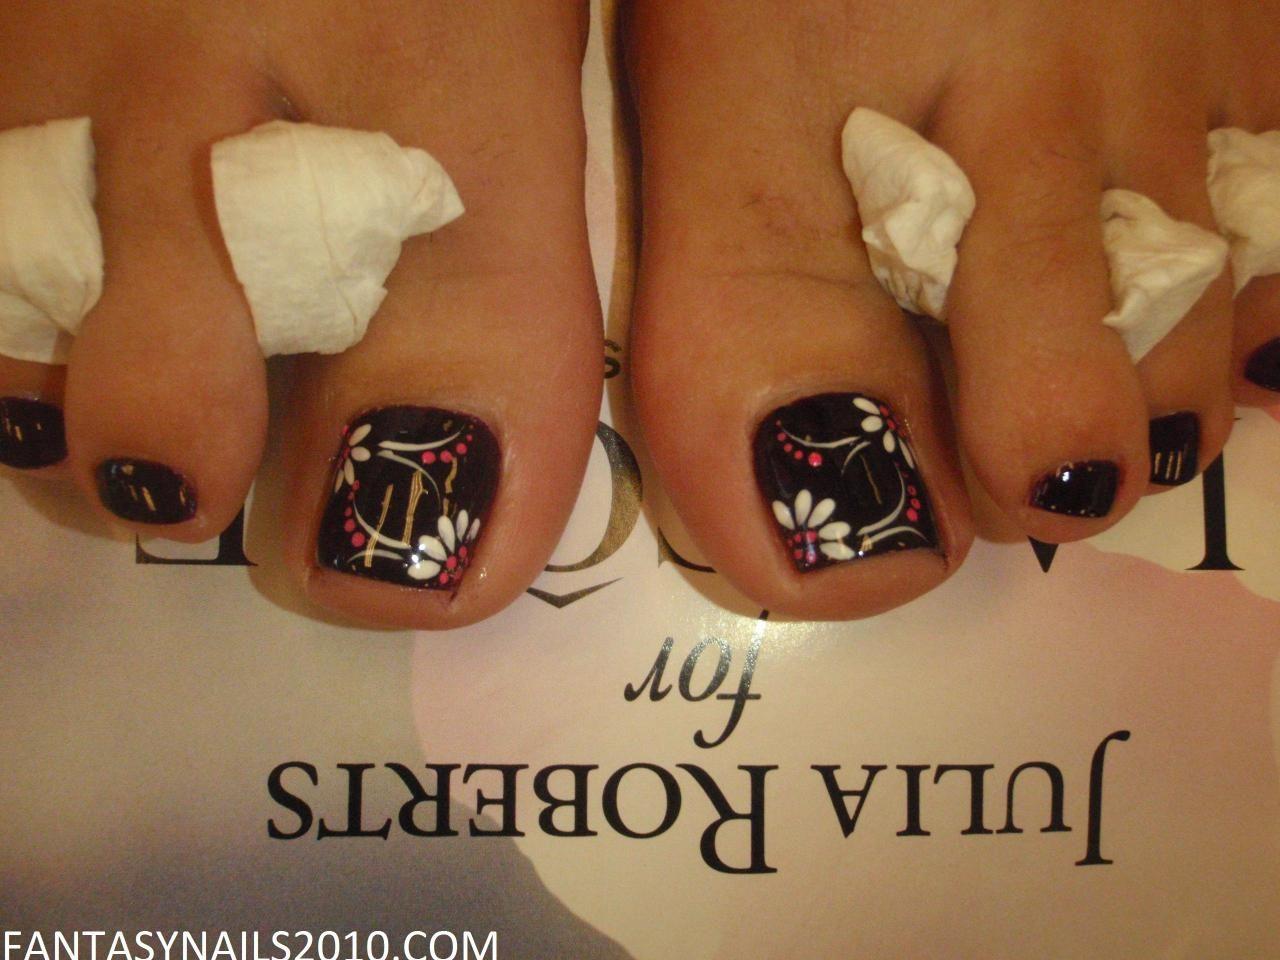 FANTASY NAILS - PEDICURE DESIGN   Nails   Pinterest